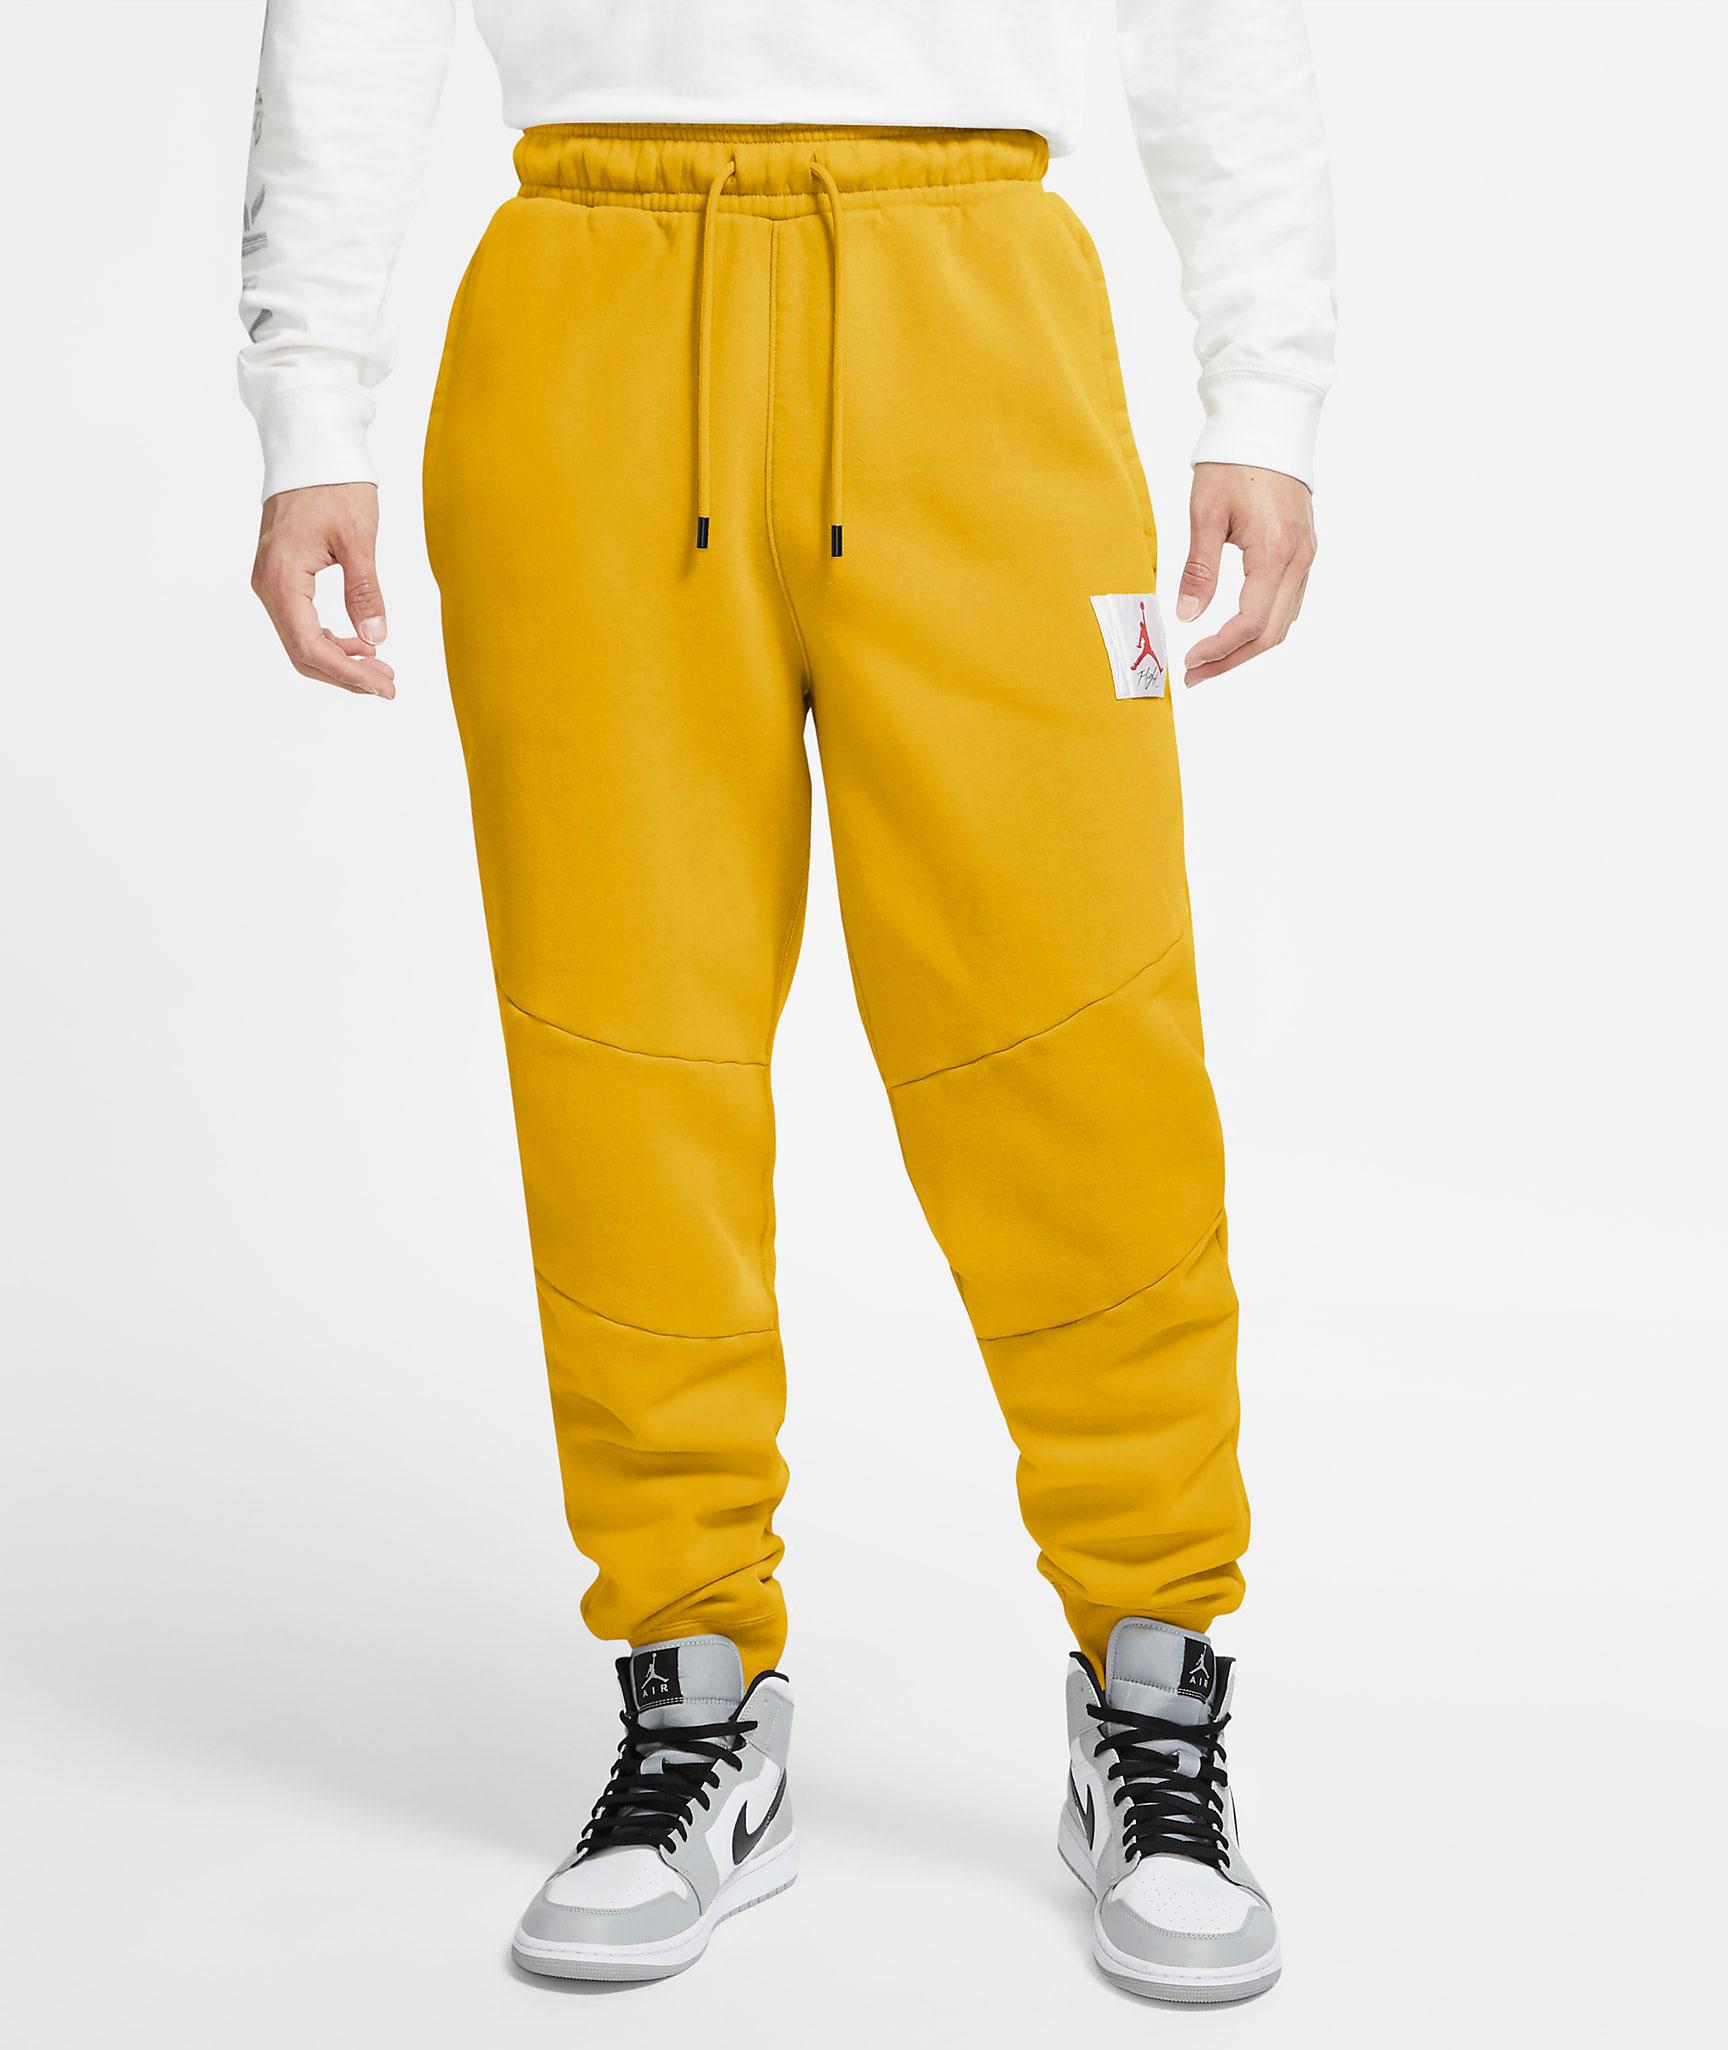 air-jordan-12-university-gold-pants